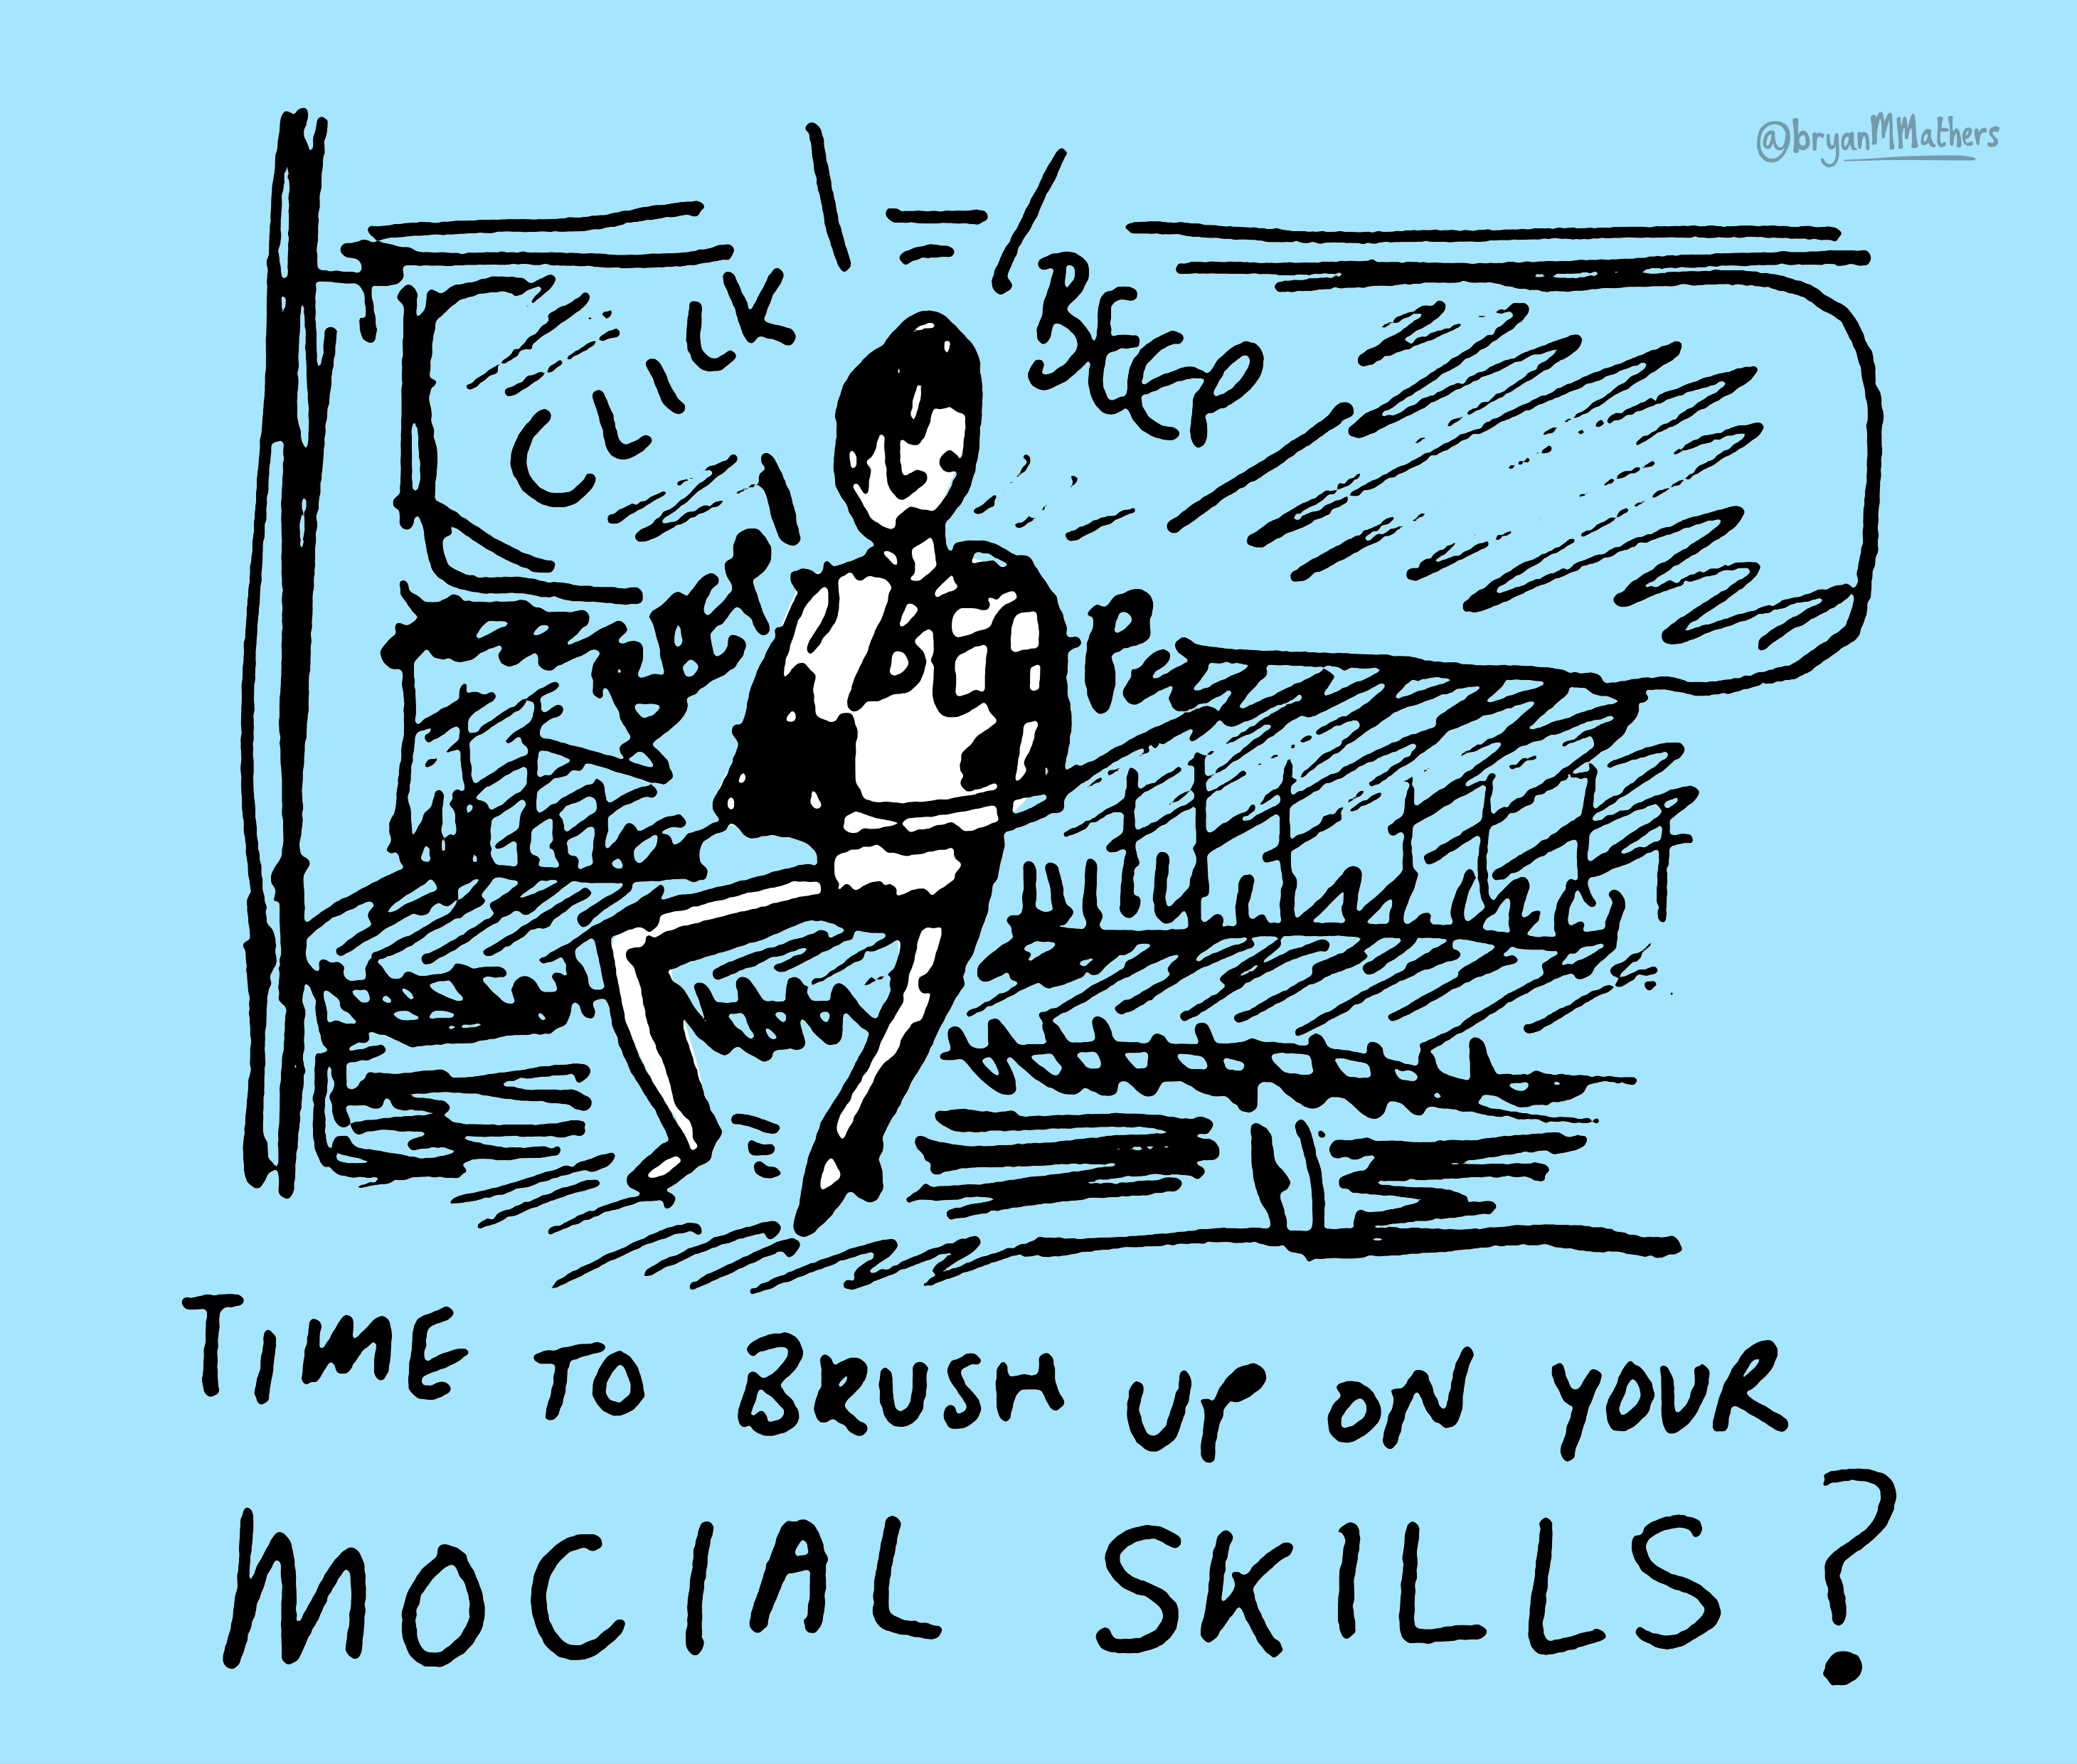 Mocial skills…